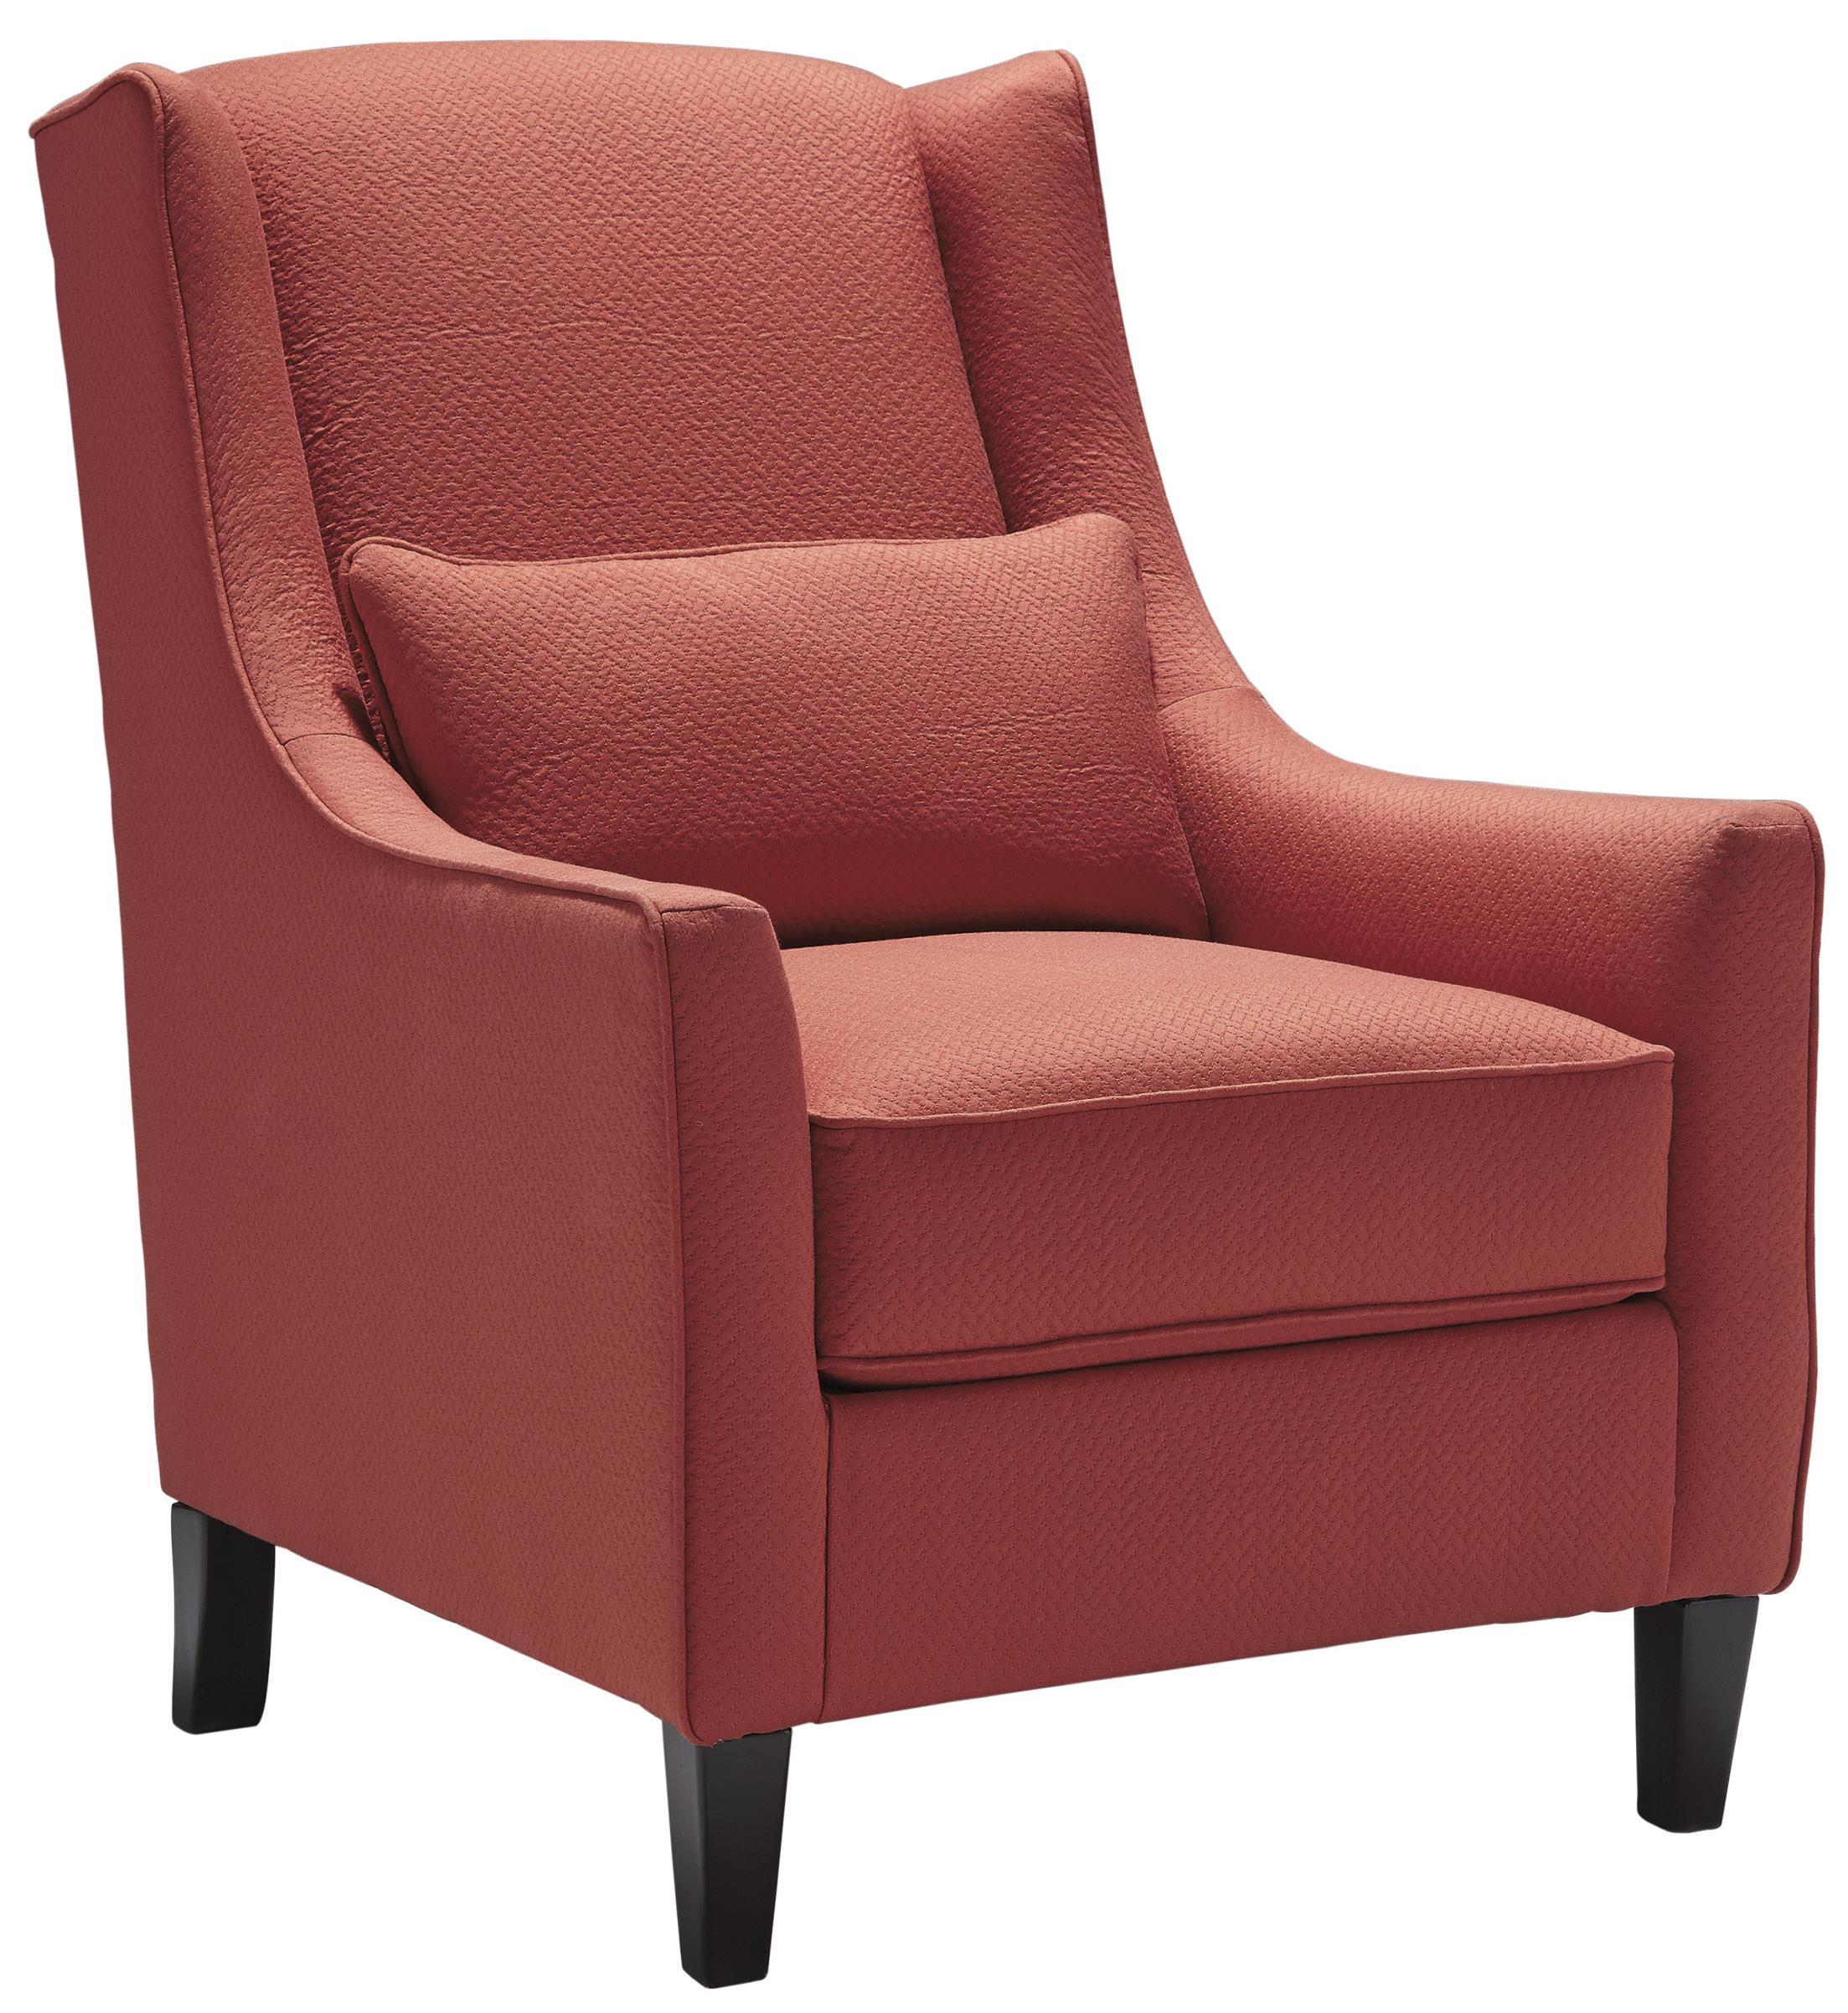 Benchcraft Sansimeon Accent Chair - Item Number: 7990421